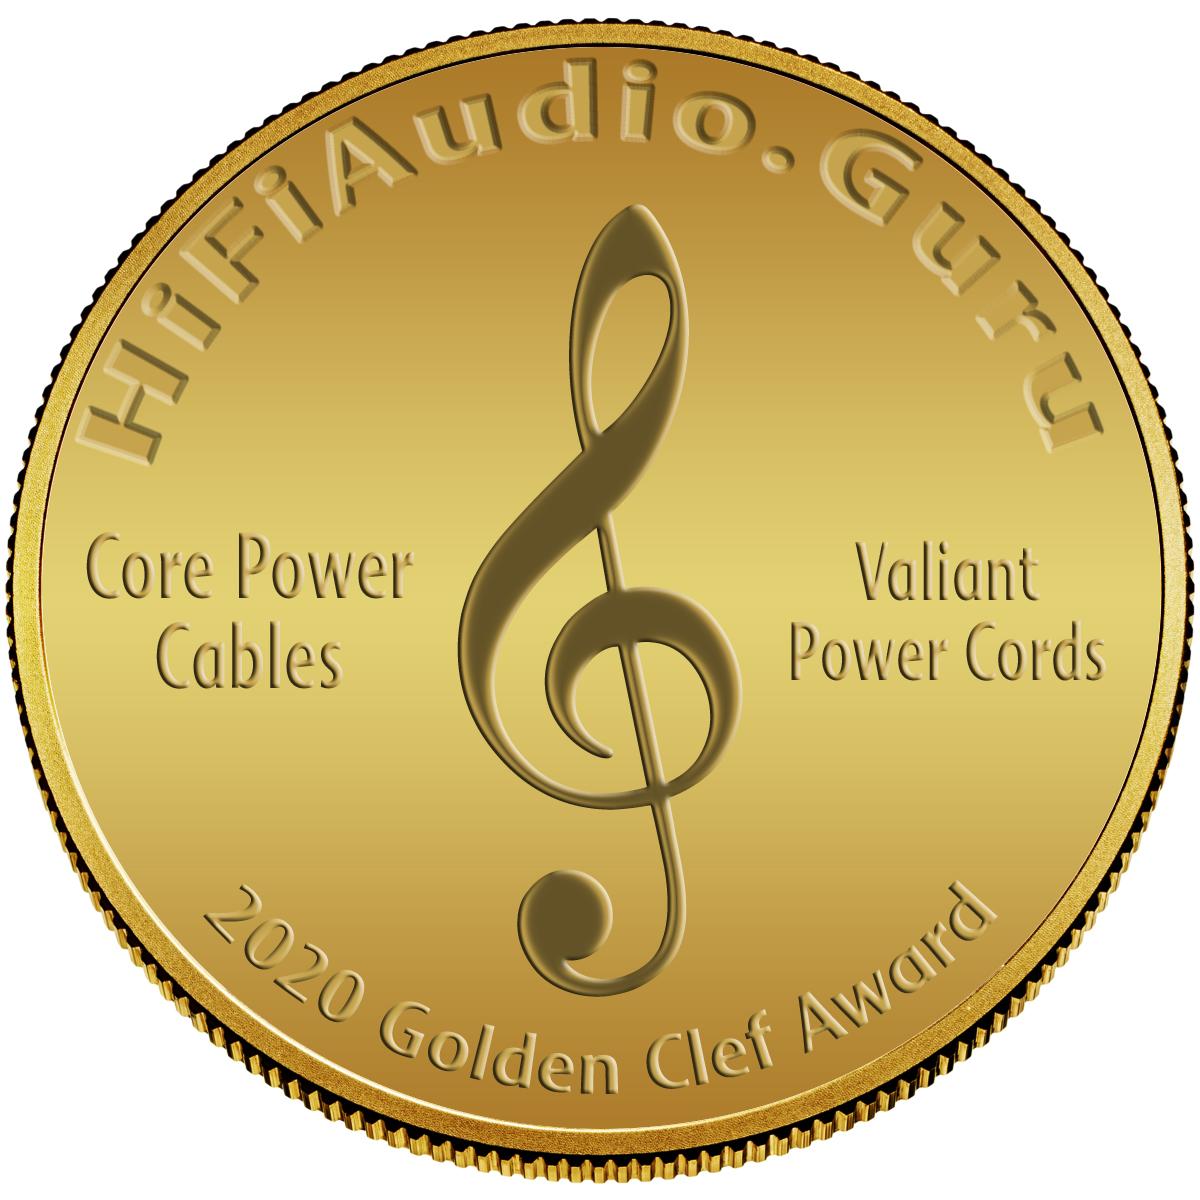 Core Power Cables Valiant Power Cords